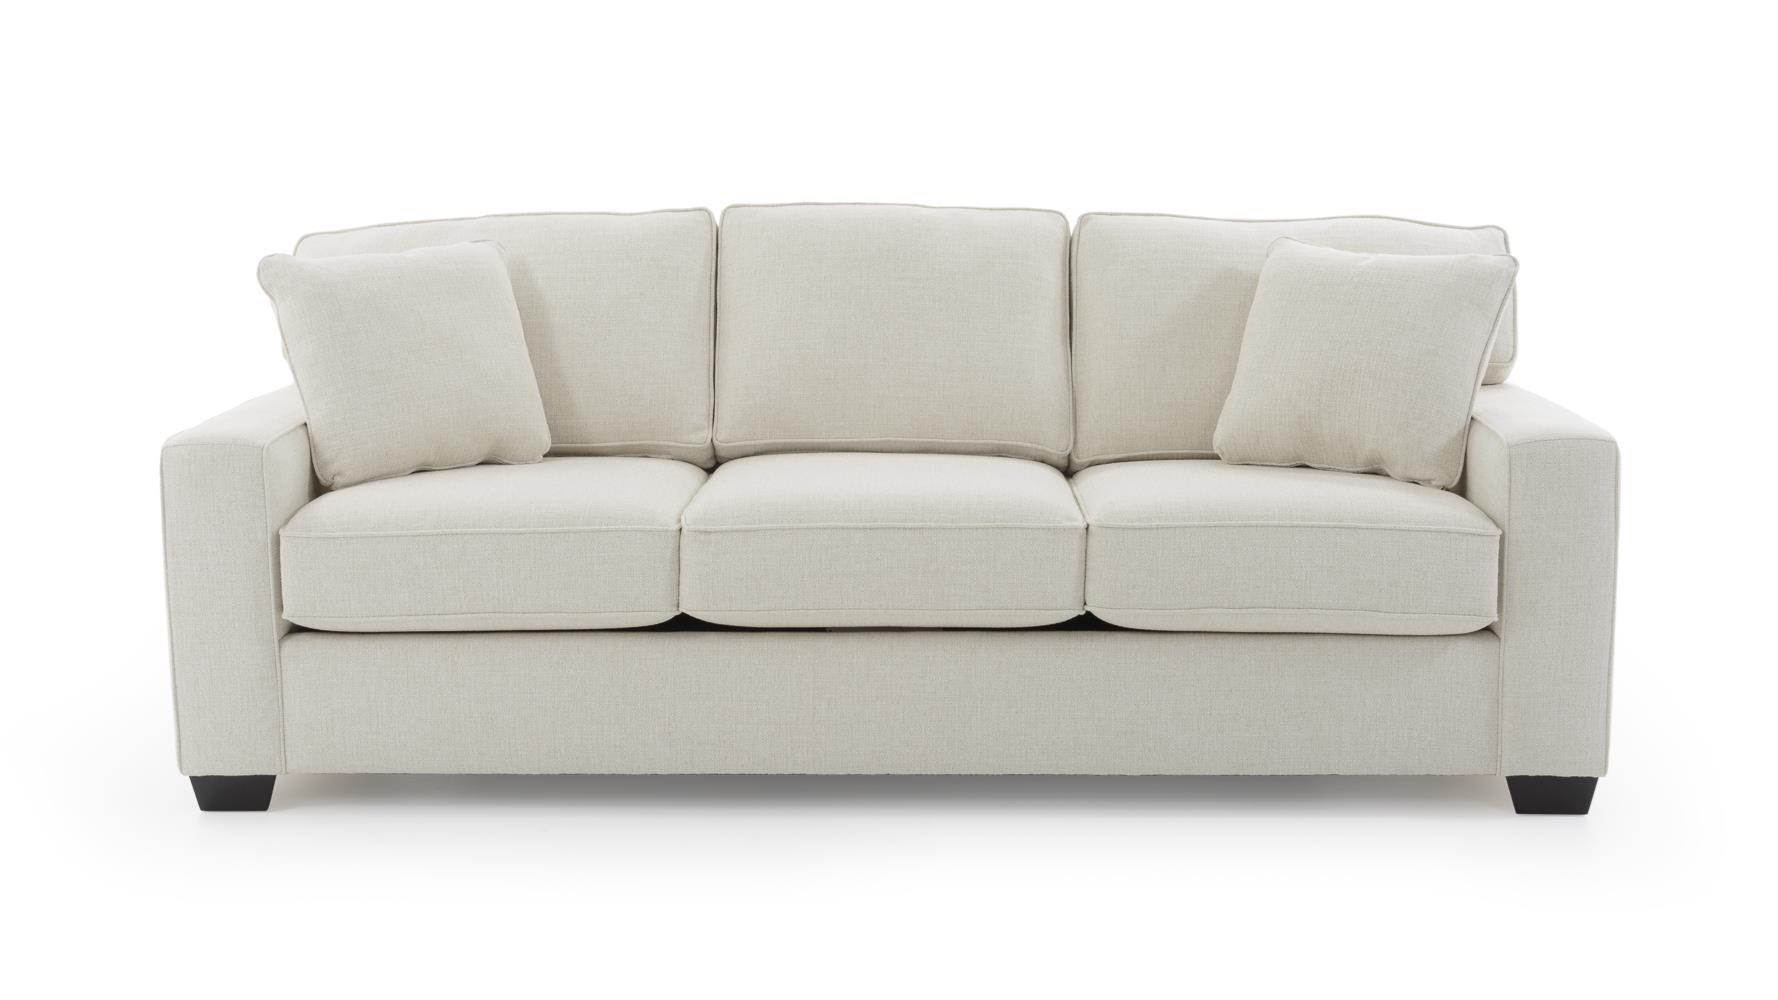 Bermuda Sofa by Max Home at Baer's Furniture